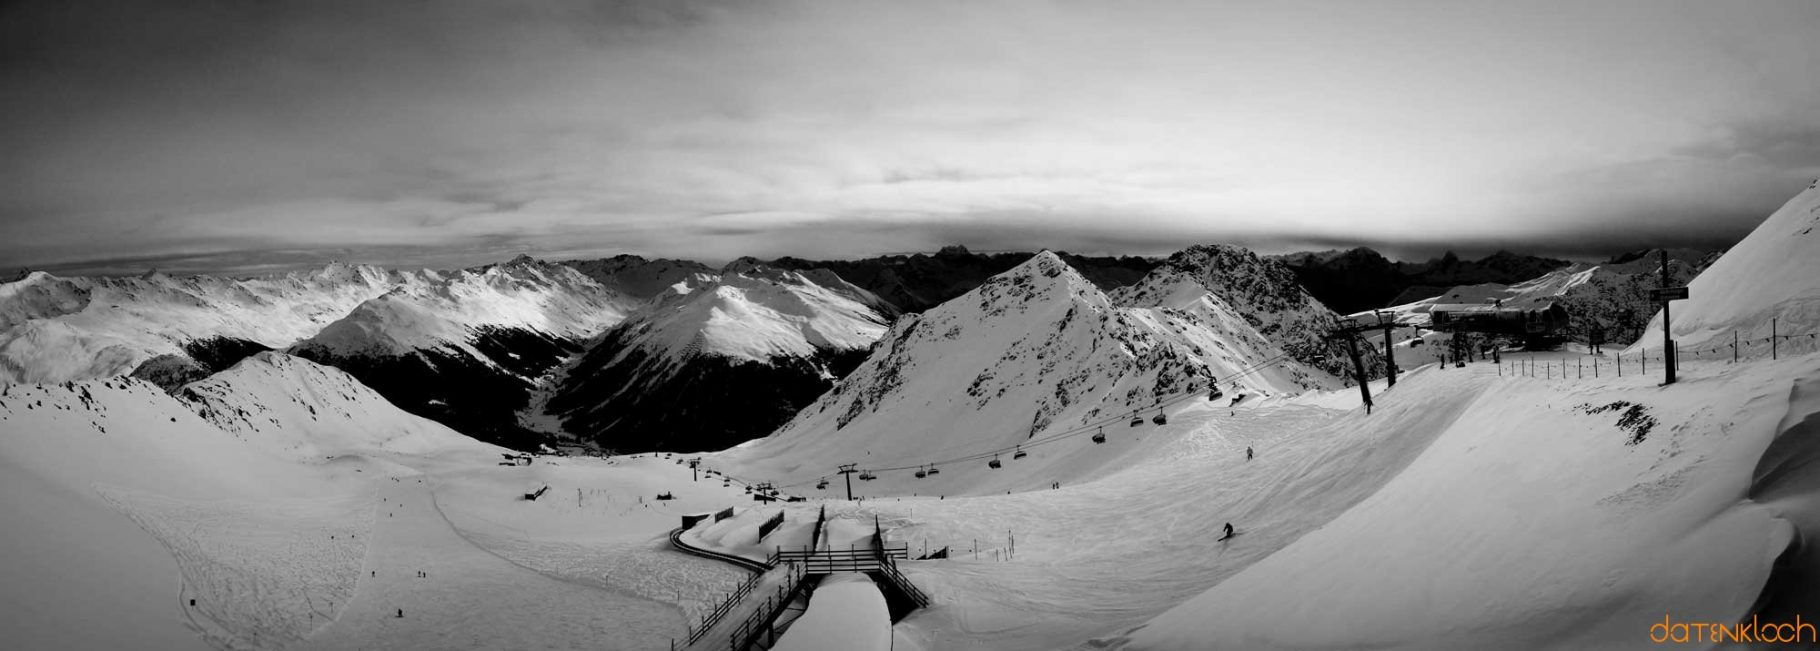 Panorama Parsenn / Davos